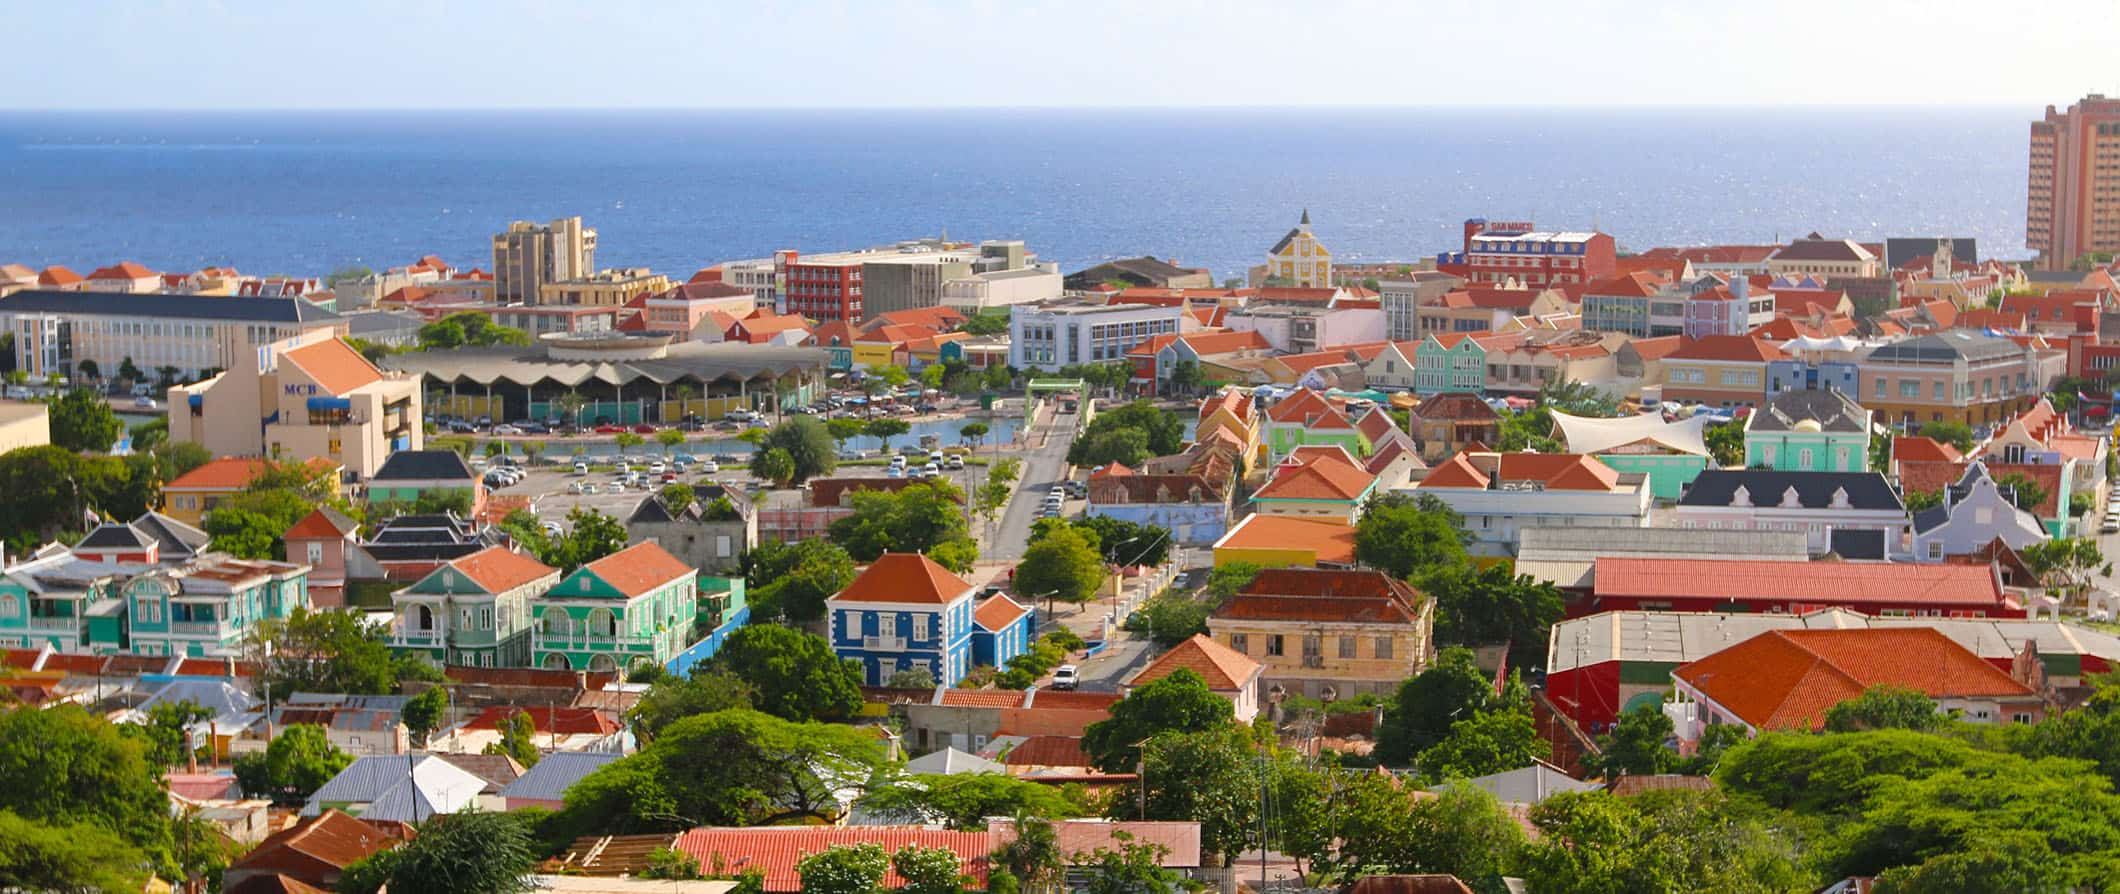 colorful buildings in aruba